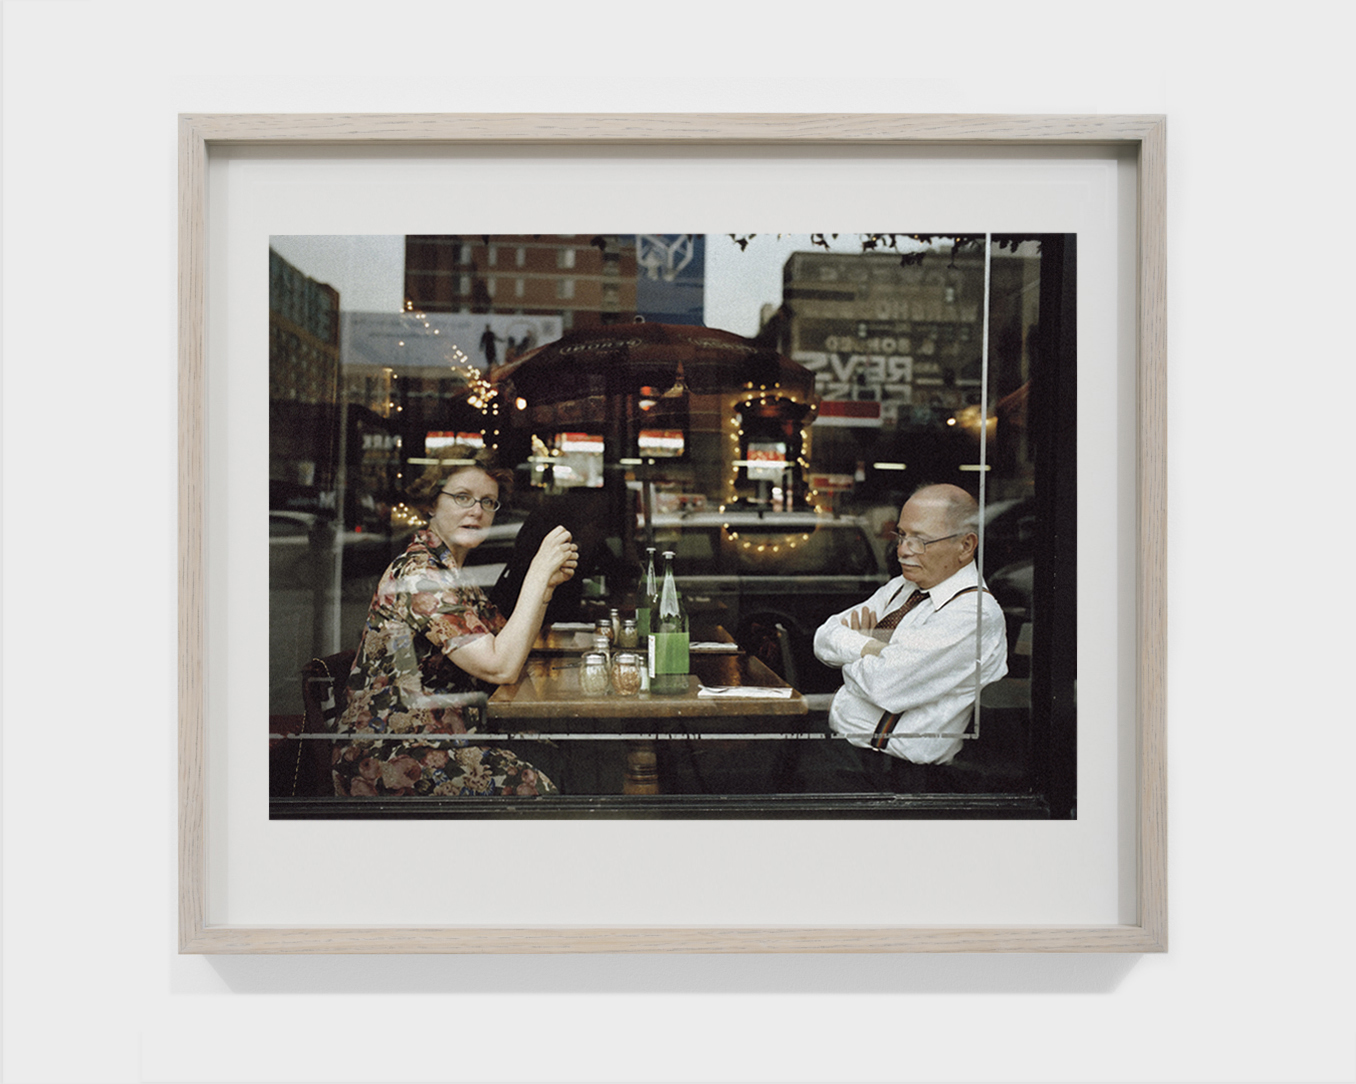 newyork_website_frame_20.jpg